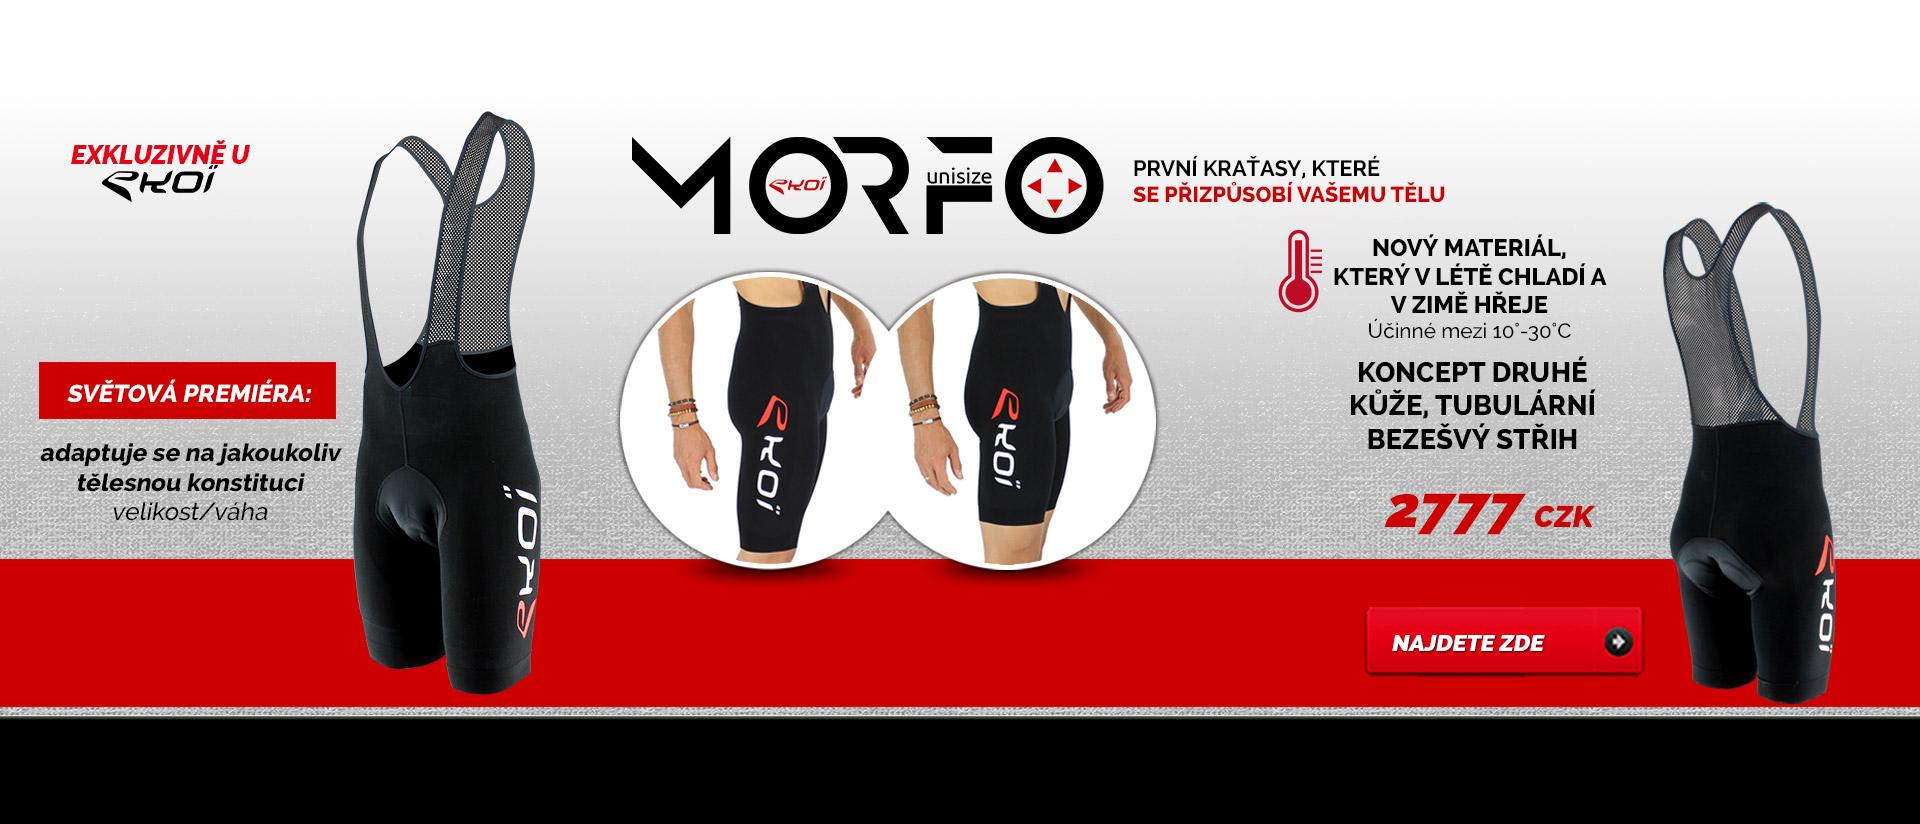 Nouveau cuissard EKOI MORFO